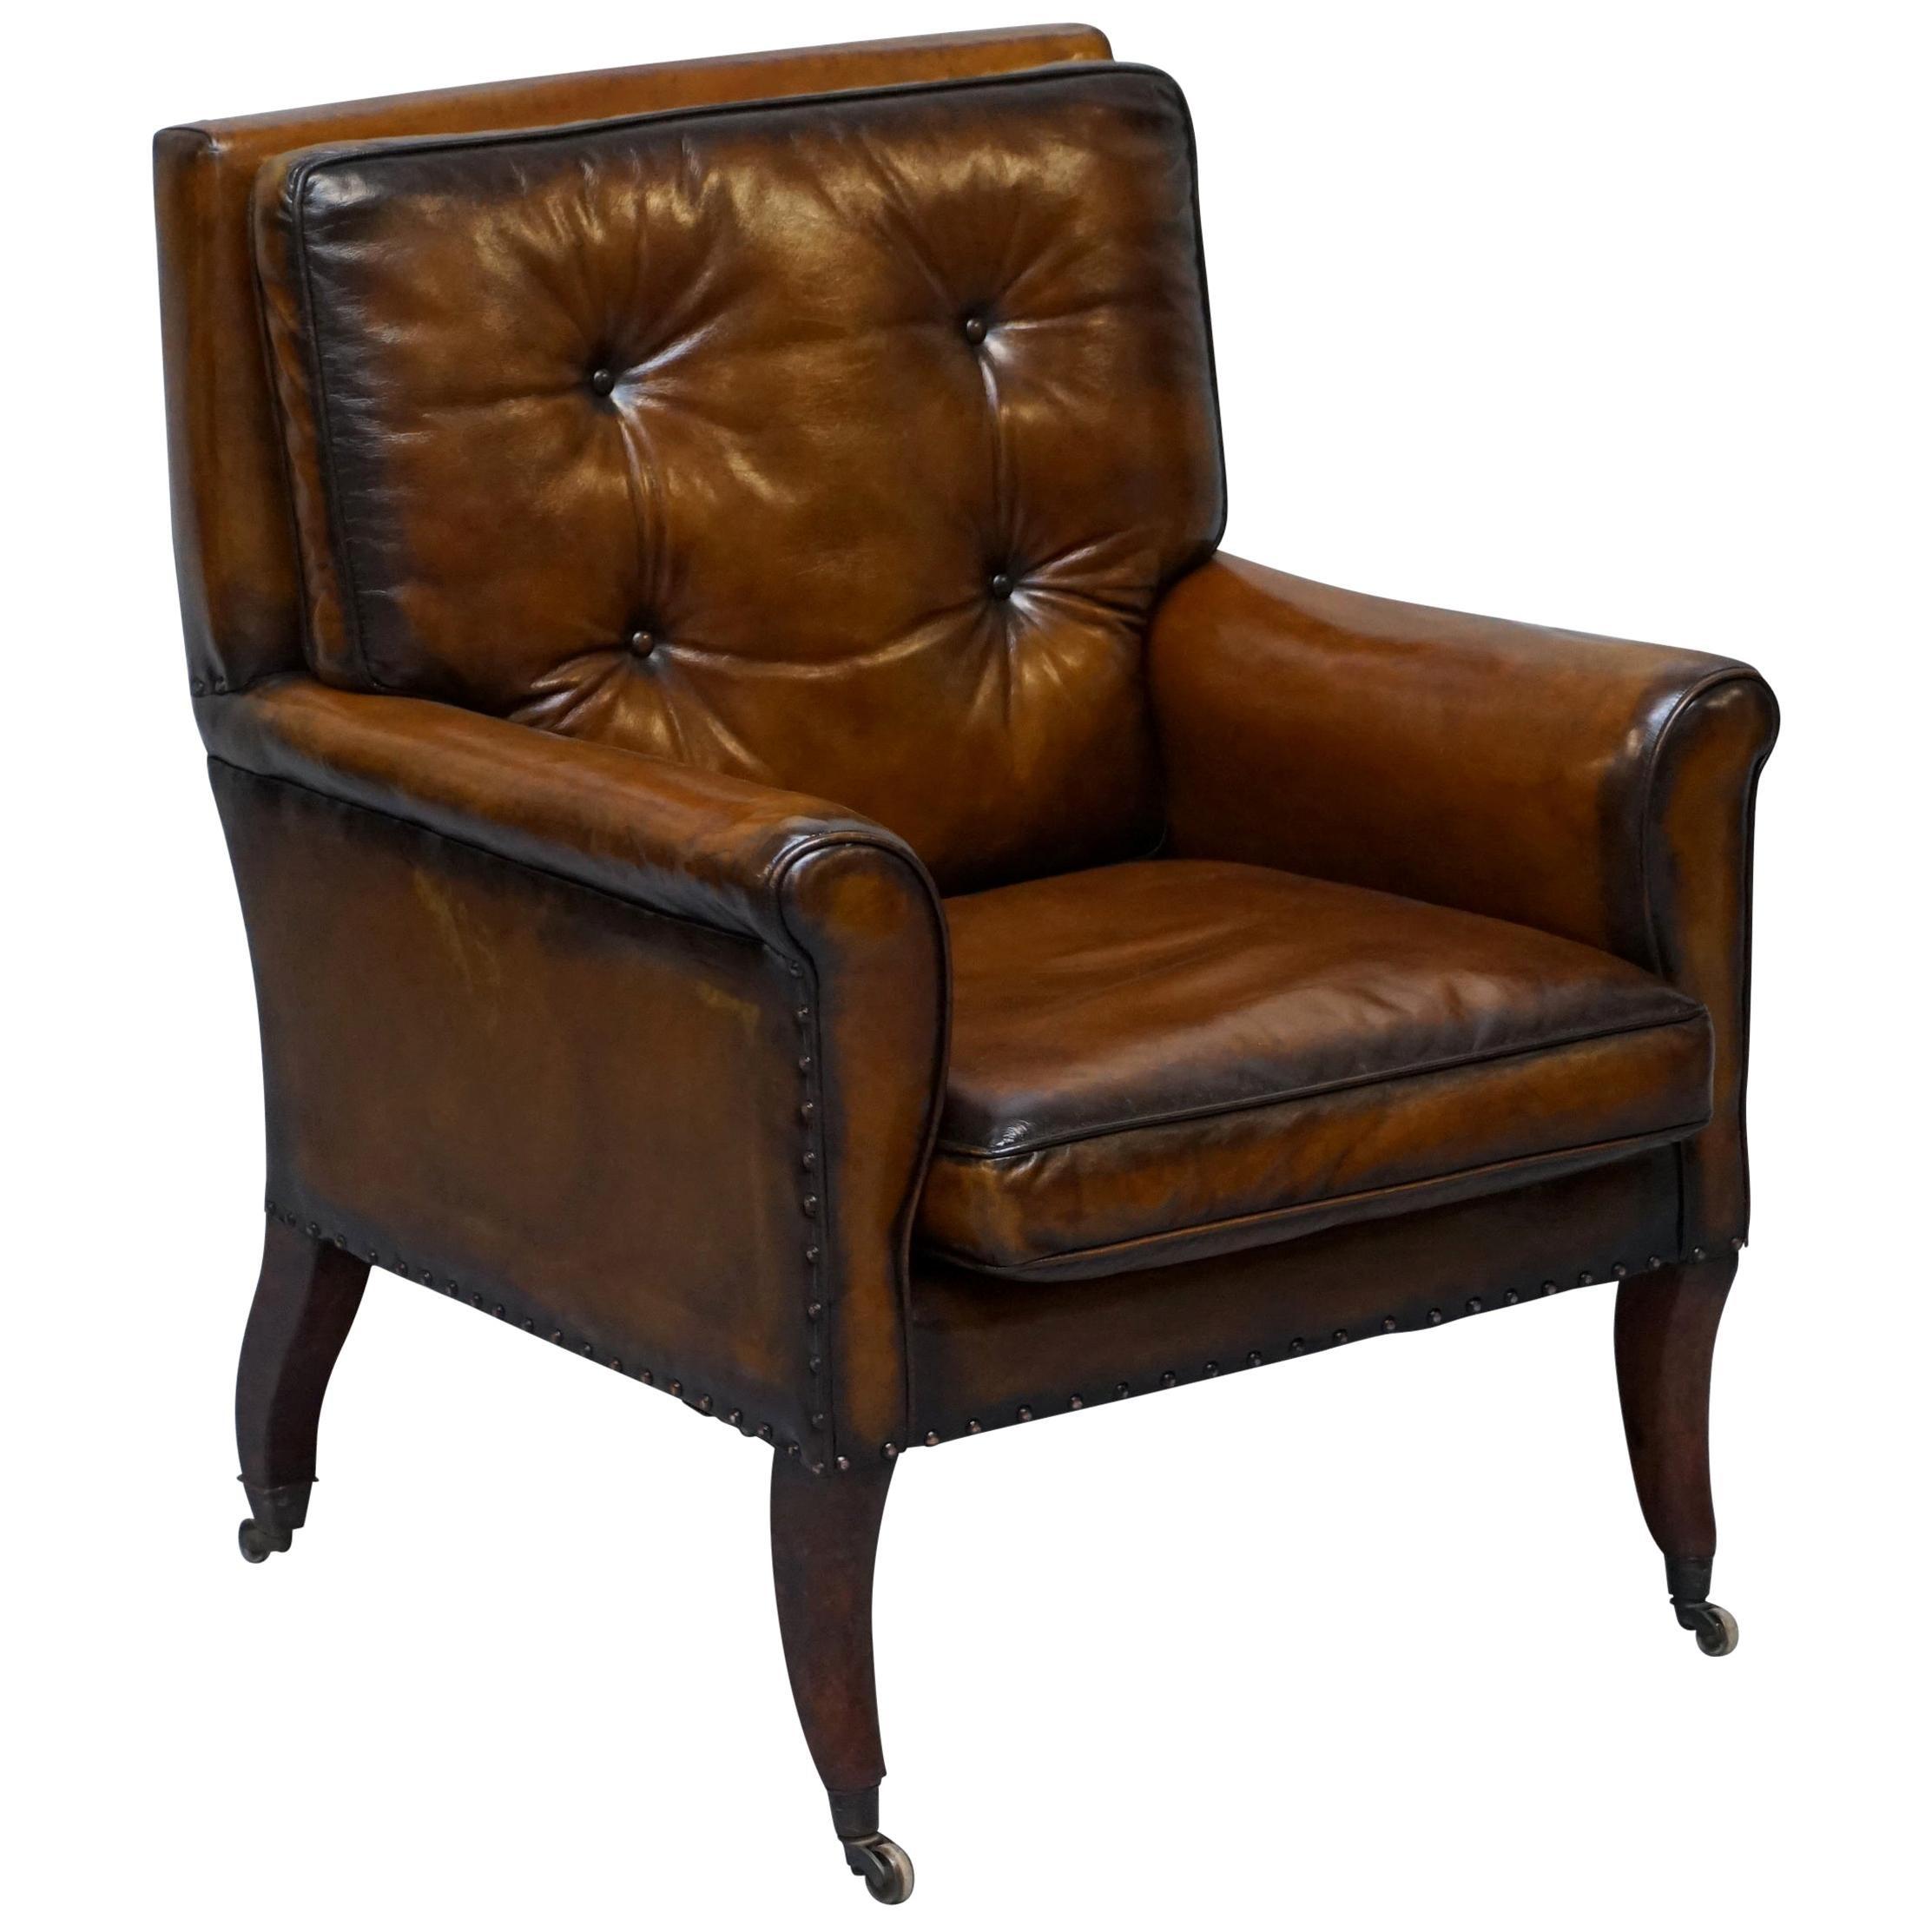 Original Regency circa 1810 Hand Dyed Brown Leather Gentleman's Club Armchair